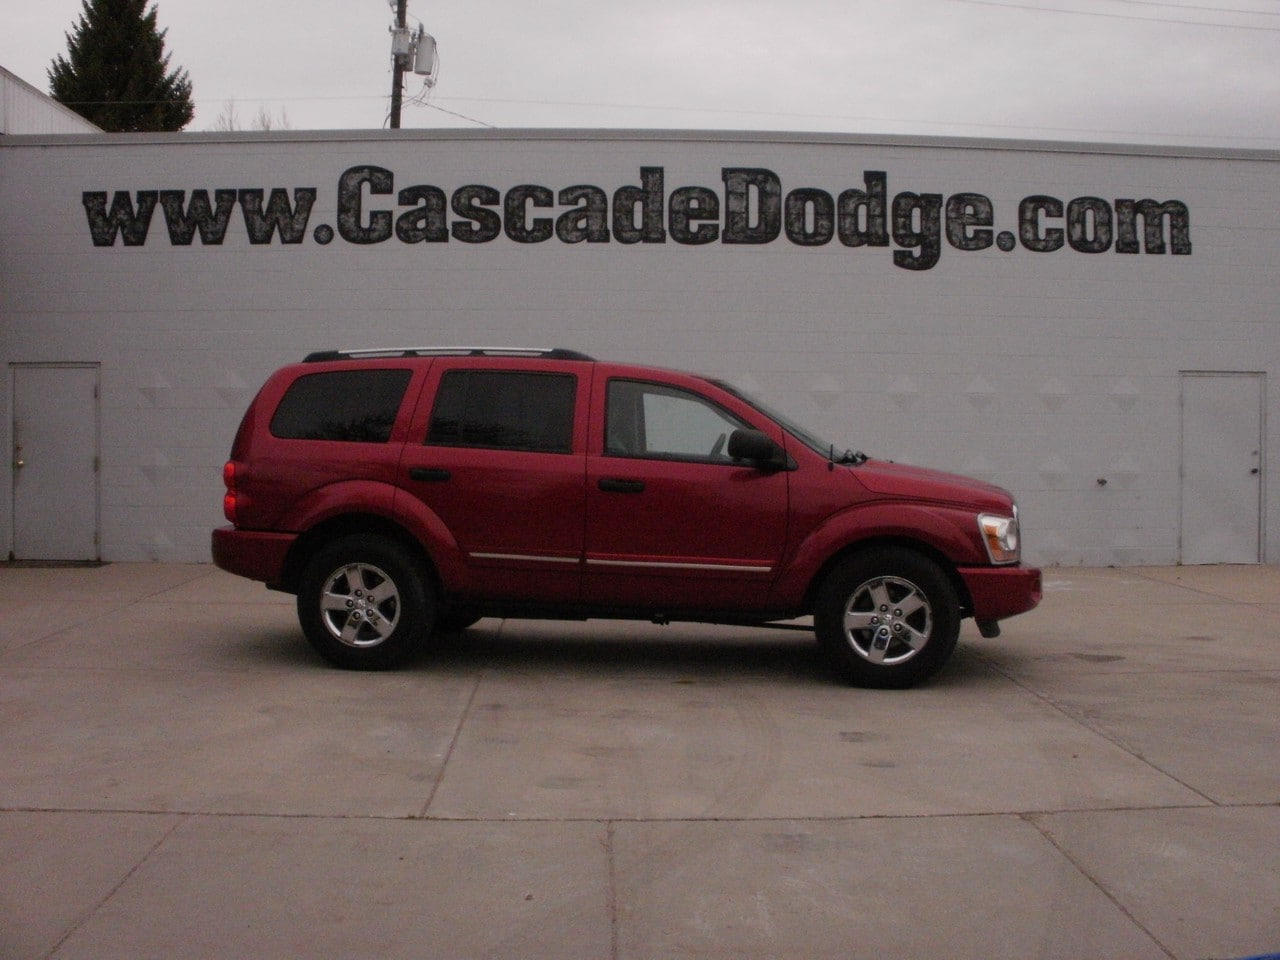 2006 Dodge Durango Limited SUV